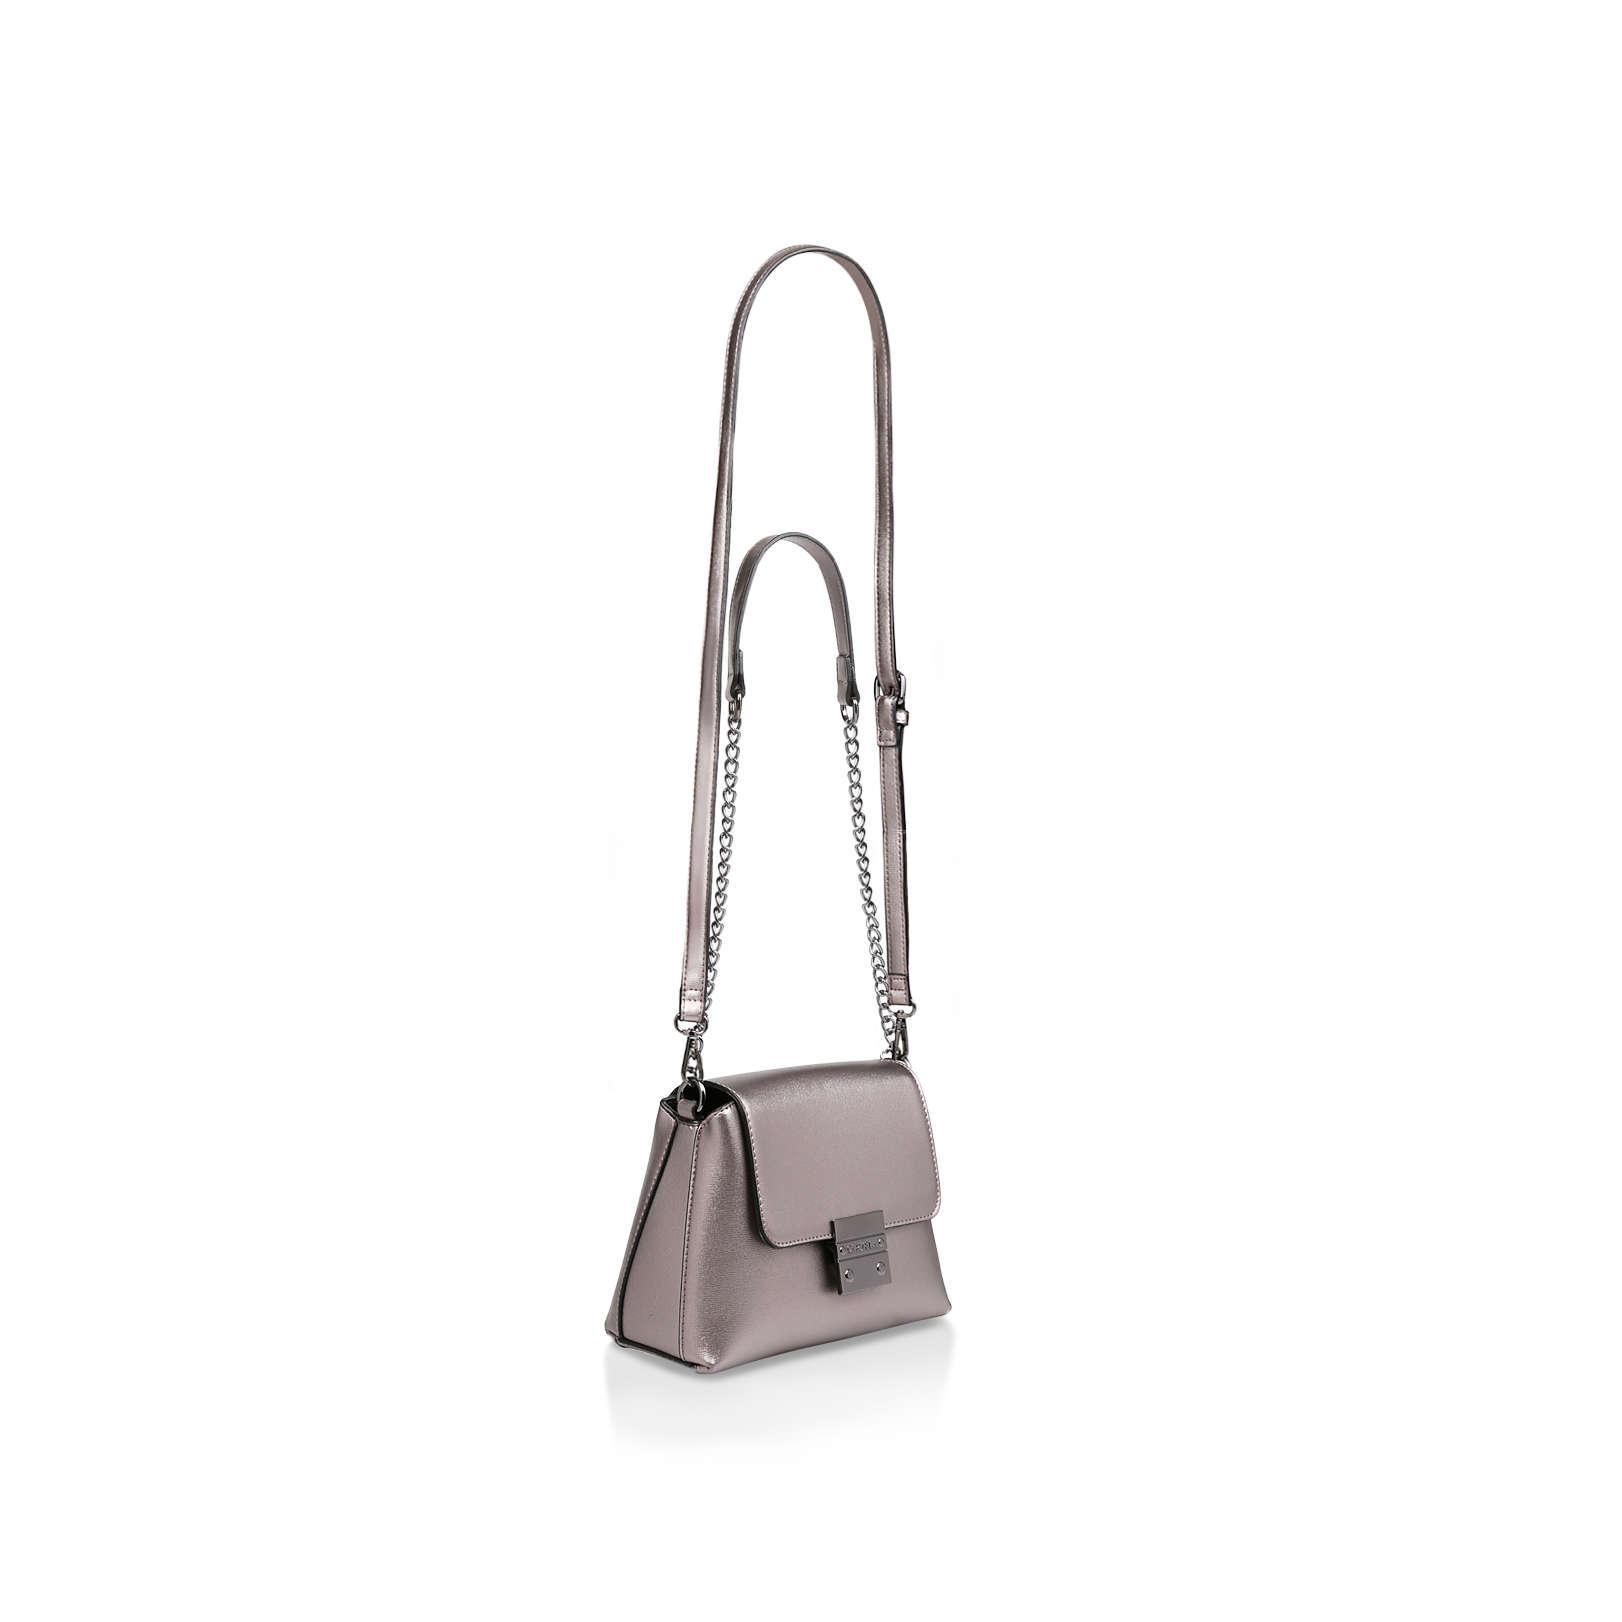 a36624c07e1 Carvela Kurt Geiger - Multicolor Mini Blink Shoulder Bag - Lyst. View  fullscreen